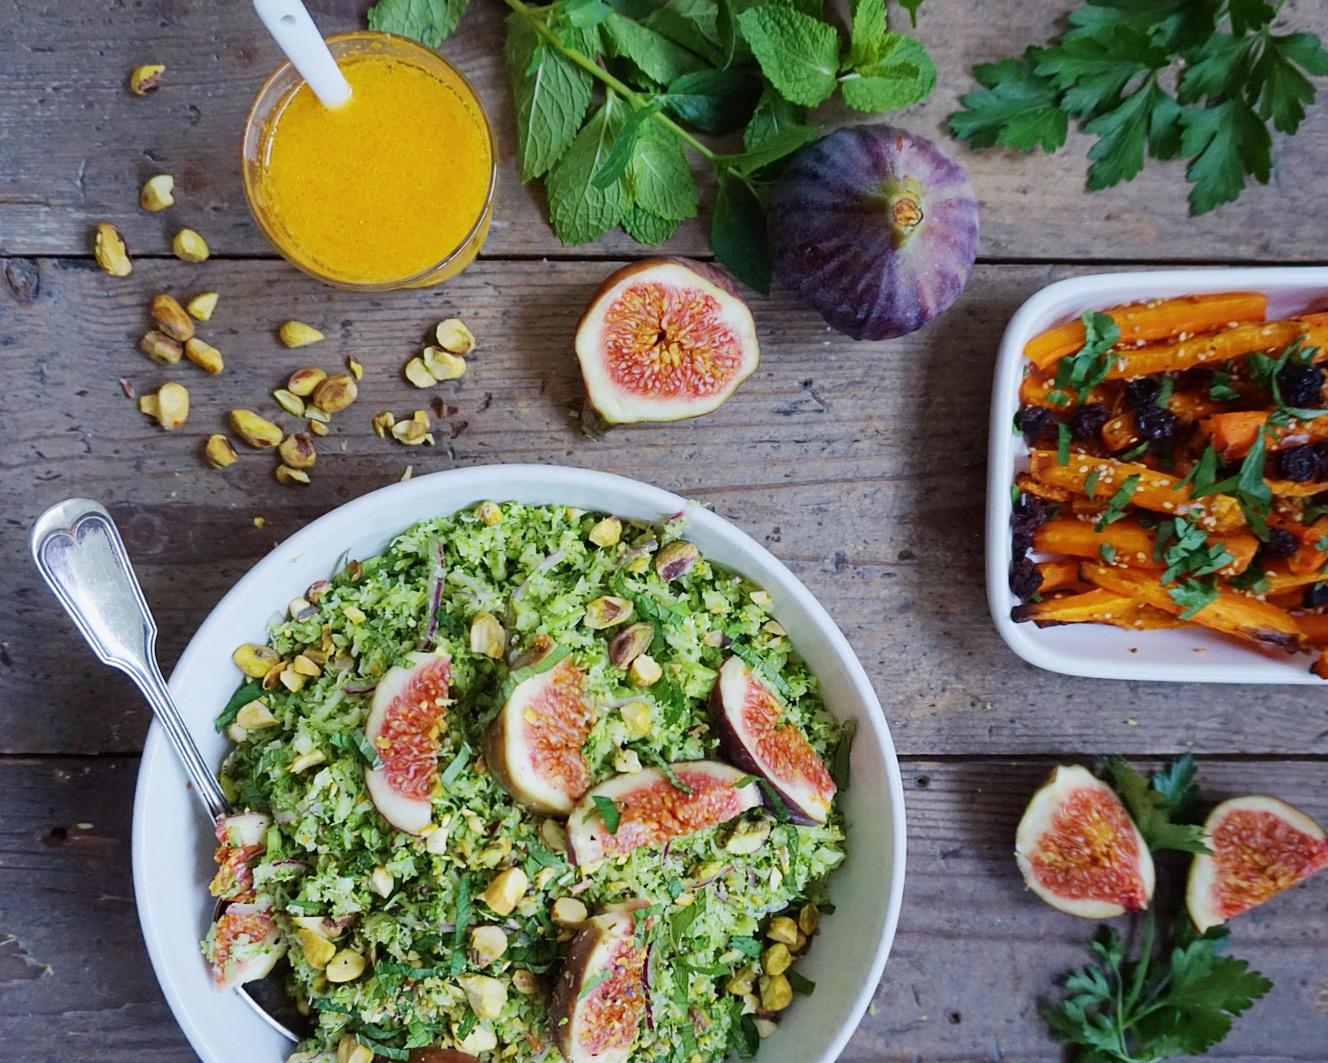 salat med broccoli og gulerødder